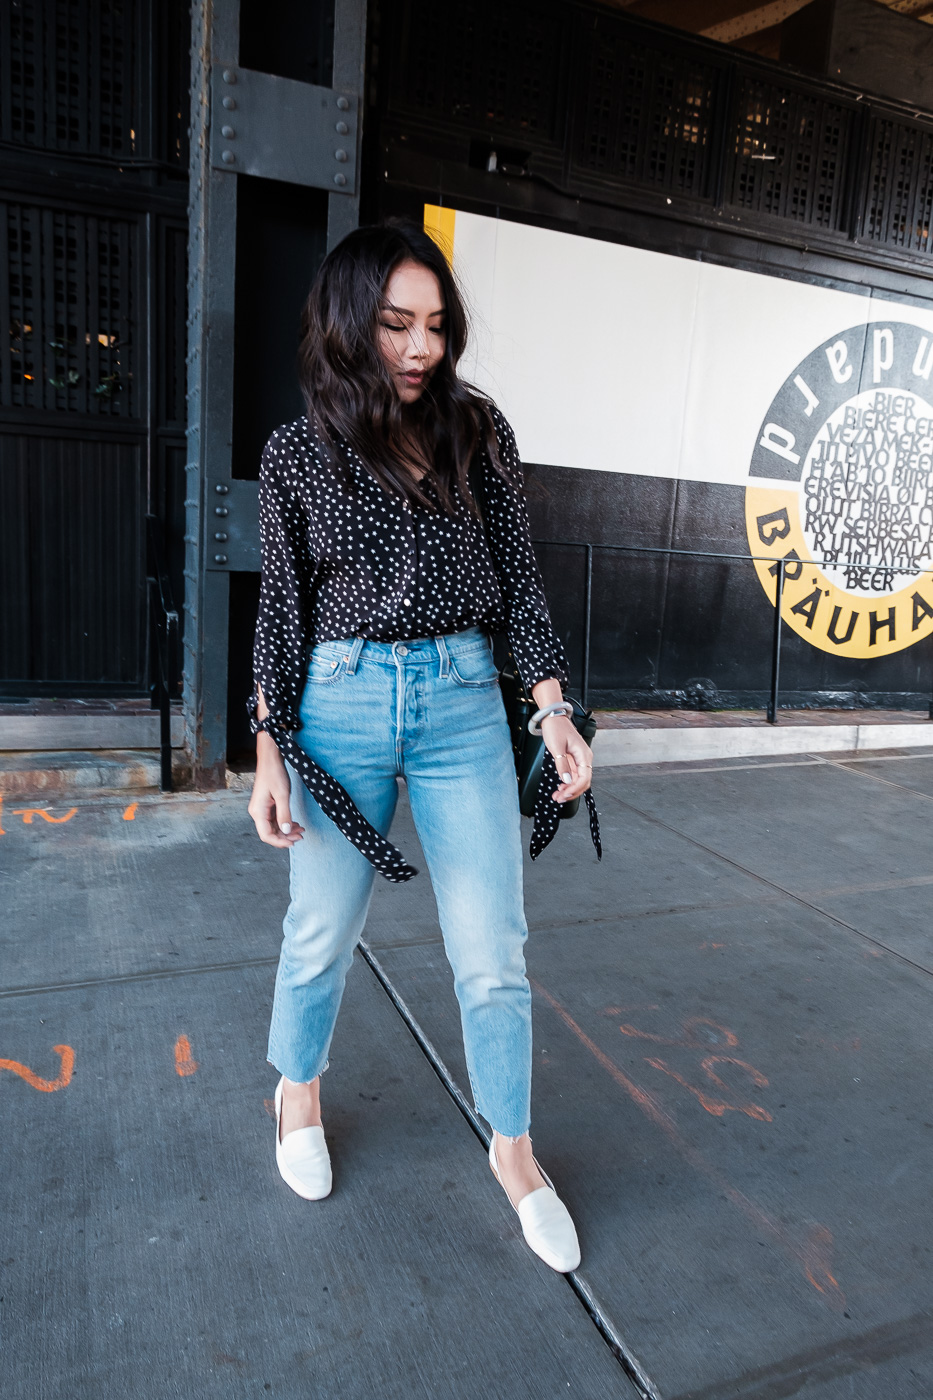 levis-wedgie-cut-jeans-madewell-silk-star-top-5